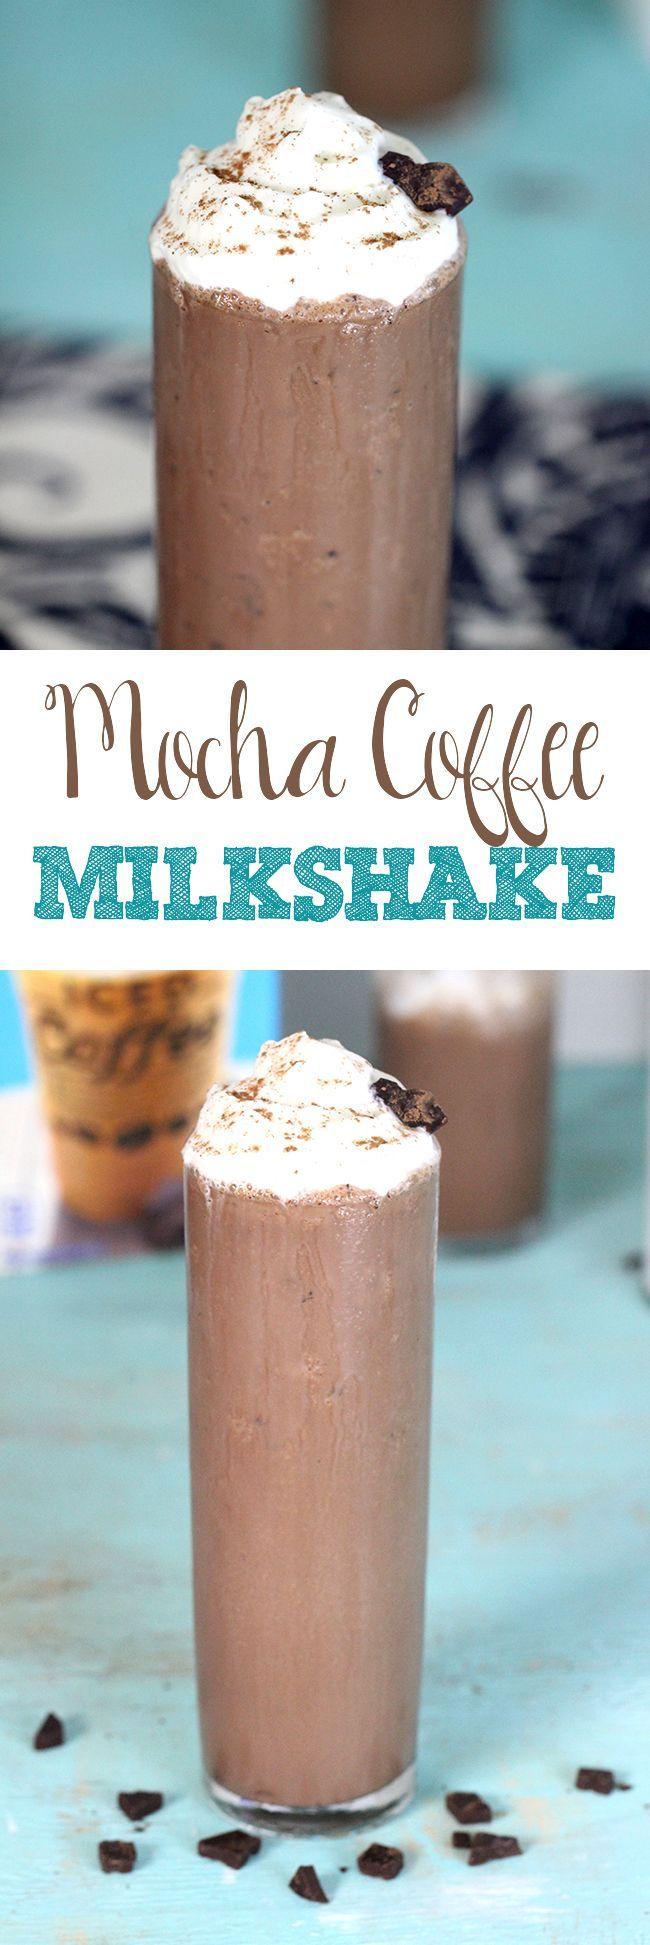 Me Time Mocha Coffee Milkshake Coffee Milkshake Milkshake Coffee Recipes